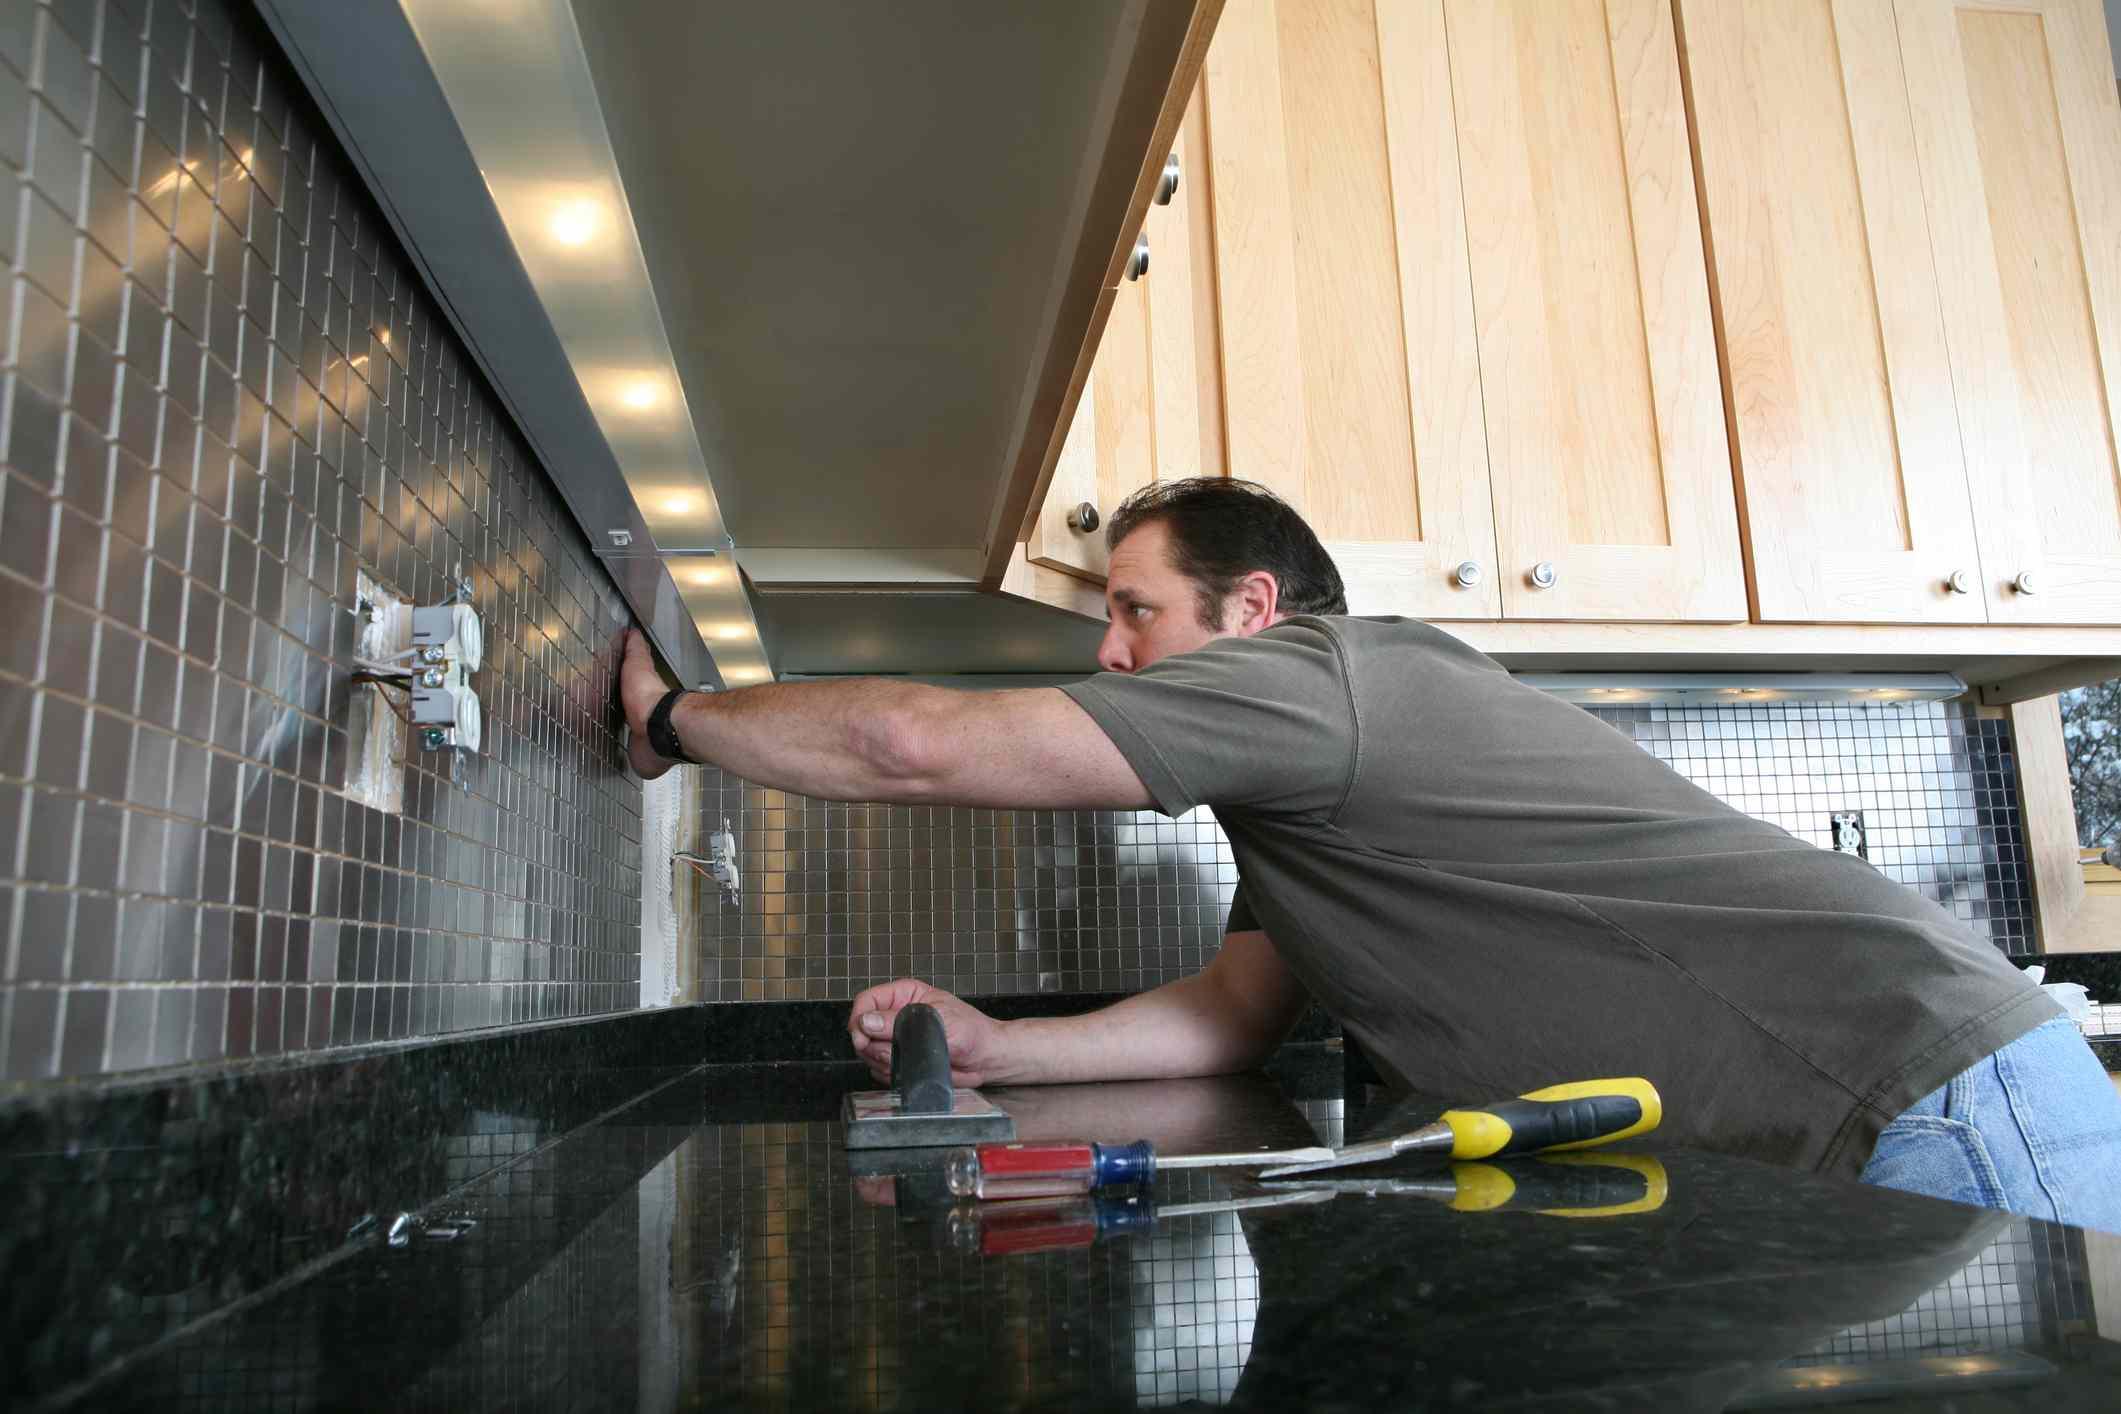 Man installing backsplash